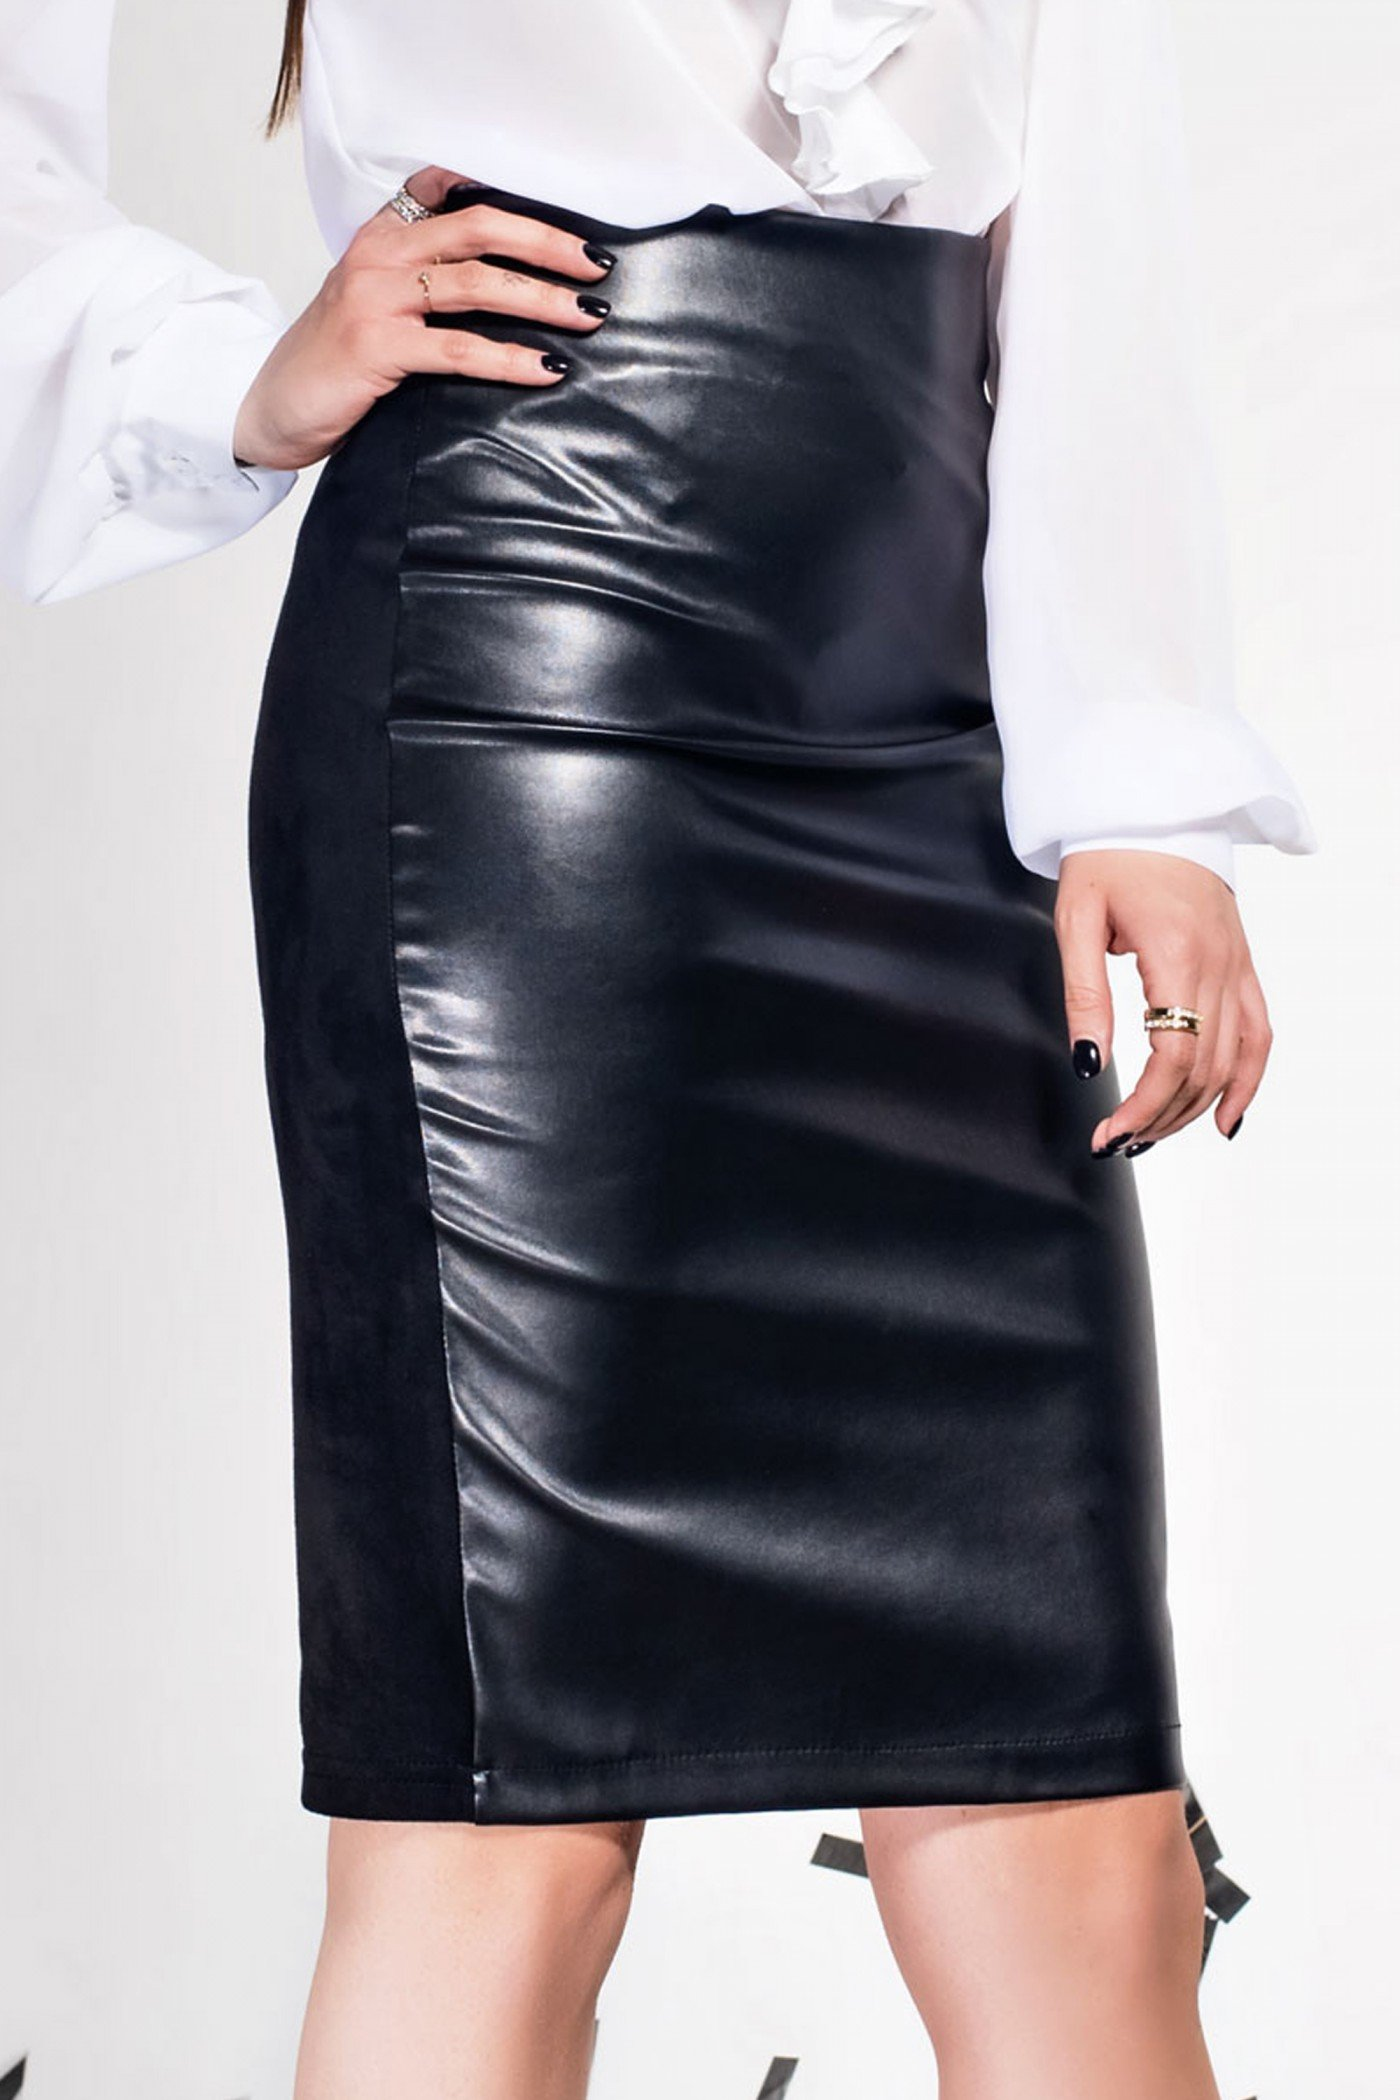 Чорна спідниця Delfi Jadone Fashion bbe23d830e0af